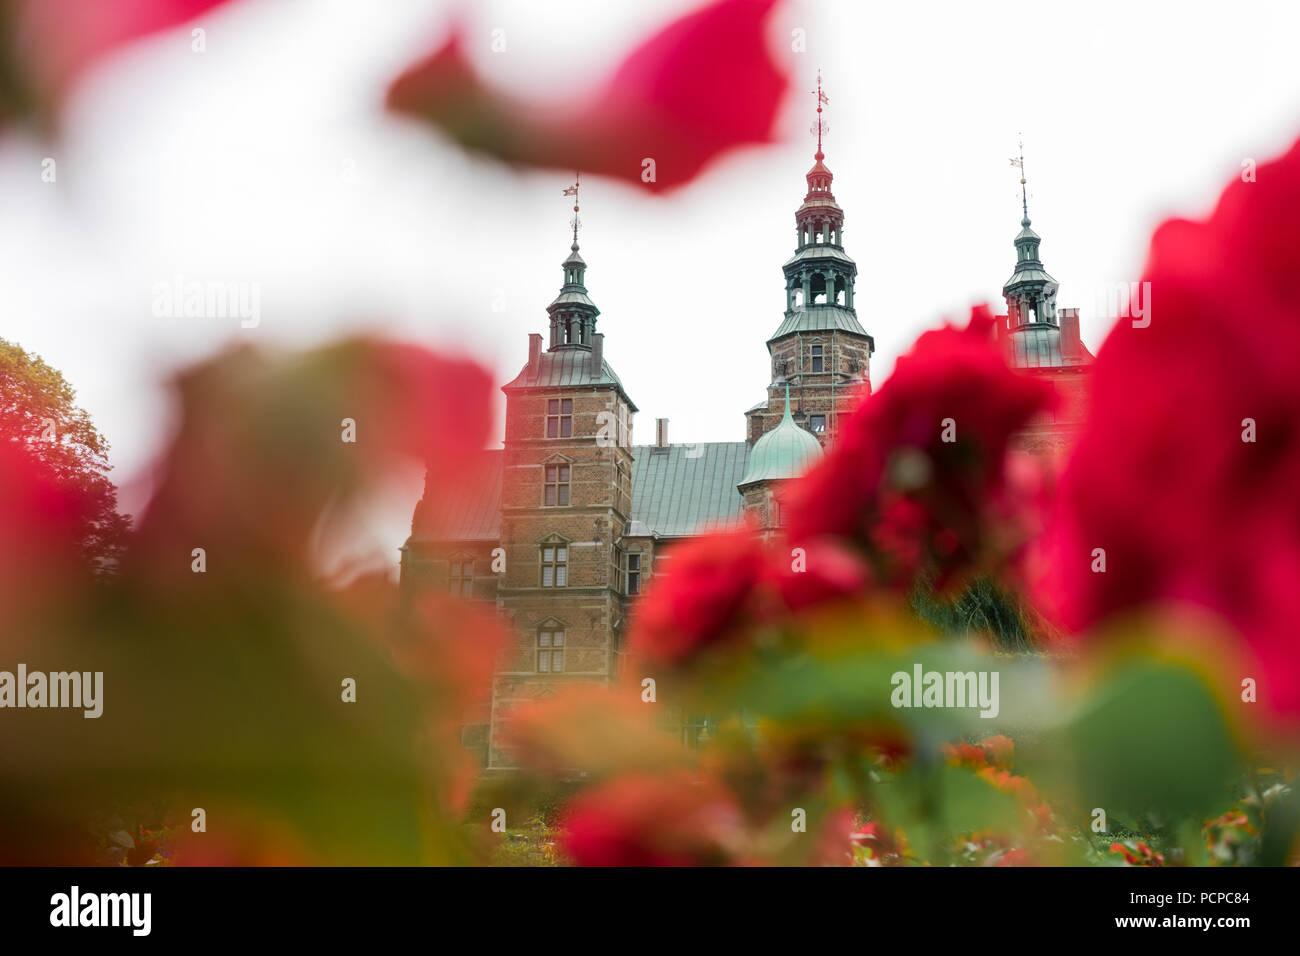 Beautiful roses blooming in the gardens of Rosenborg Castle in Copenhagen, Denmark.  Built in the Dutch Renaissance style in 1606. - Stock Image